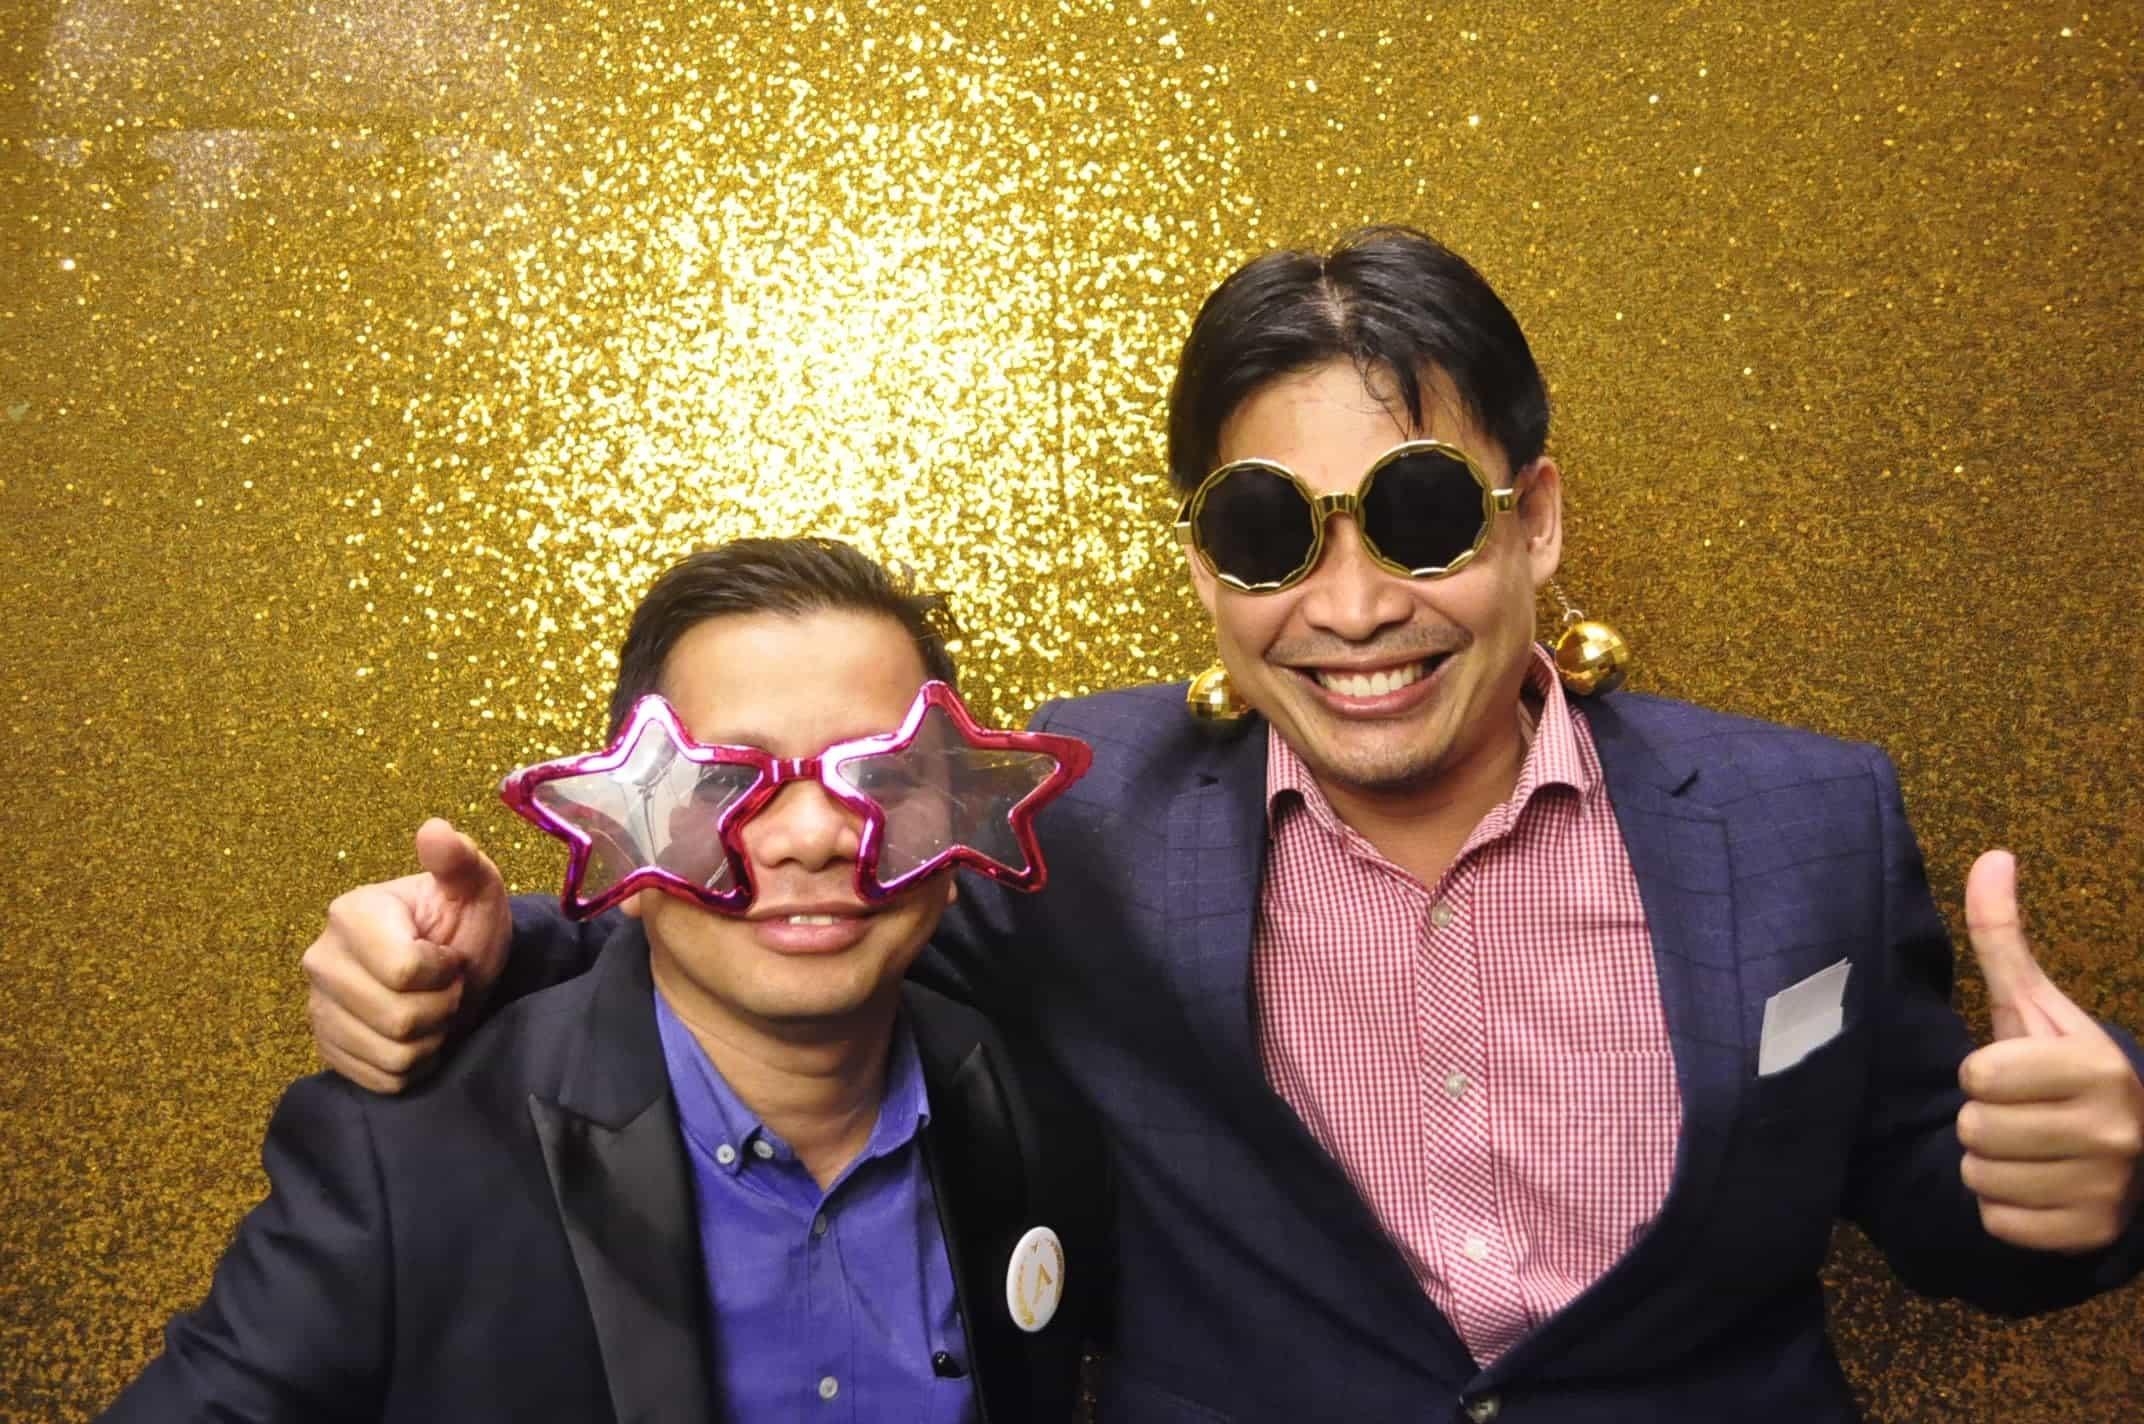 Malam Gala Anggun 2018 (Photobooth) 14